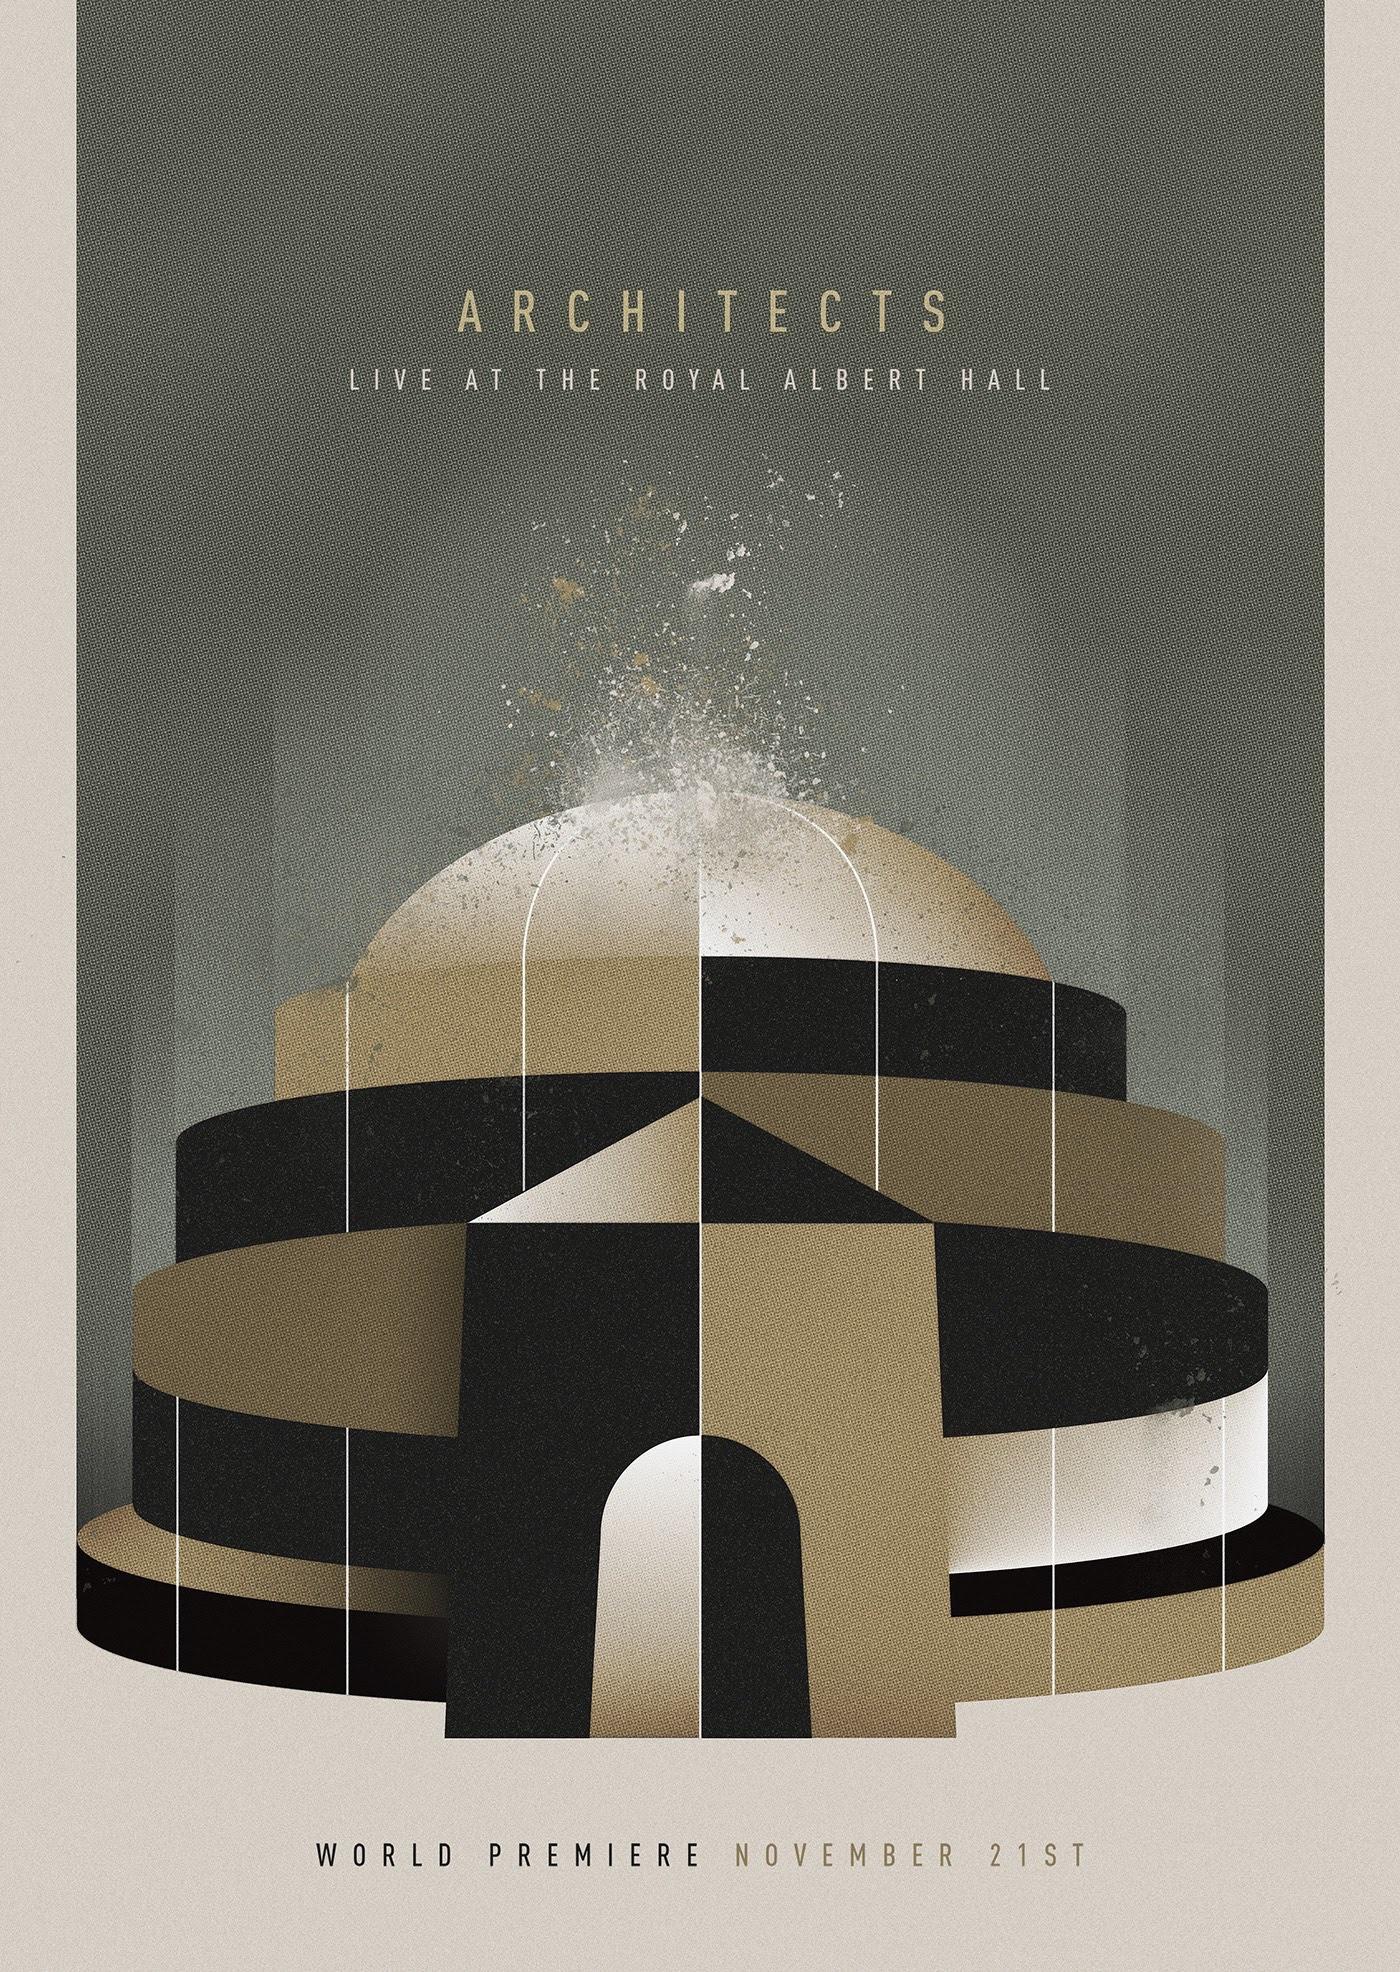 El topic de ARCHITECTS - Su nuevo disco ya disponible - Página 2 EmZuTk9XUAkgTlb?format=jpg&name=large